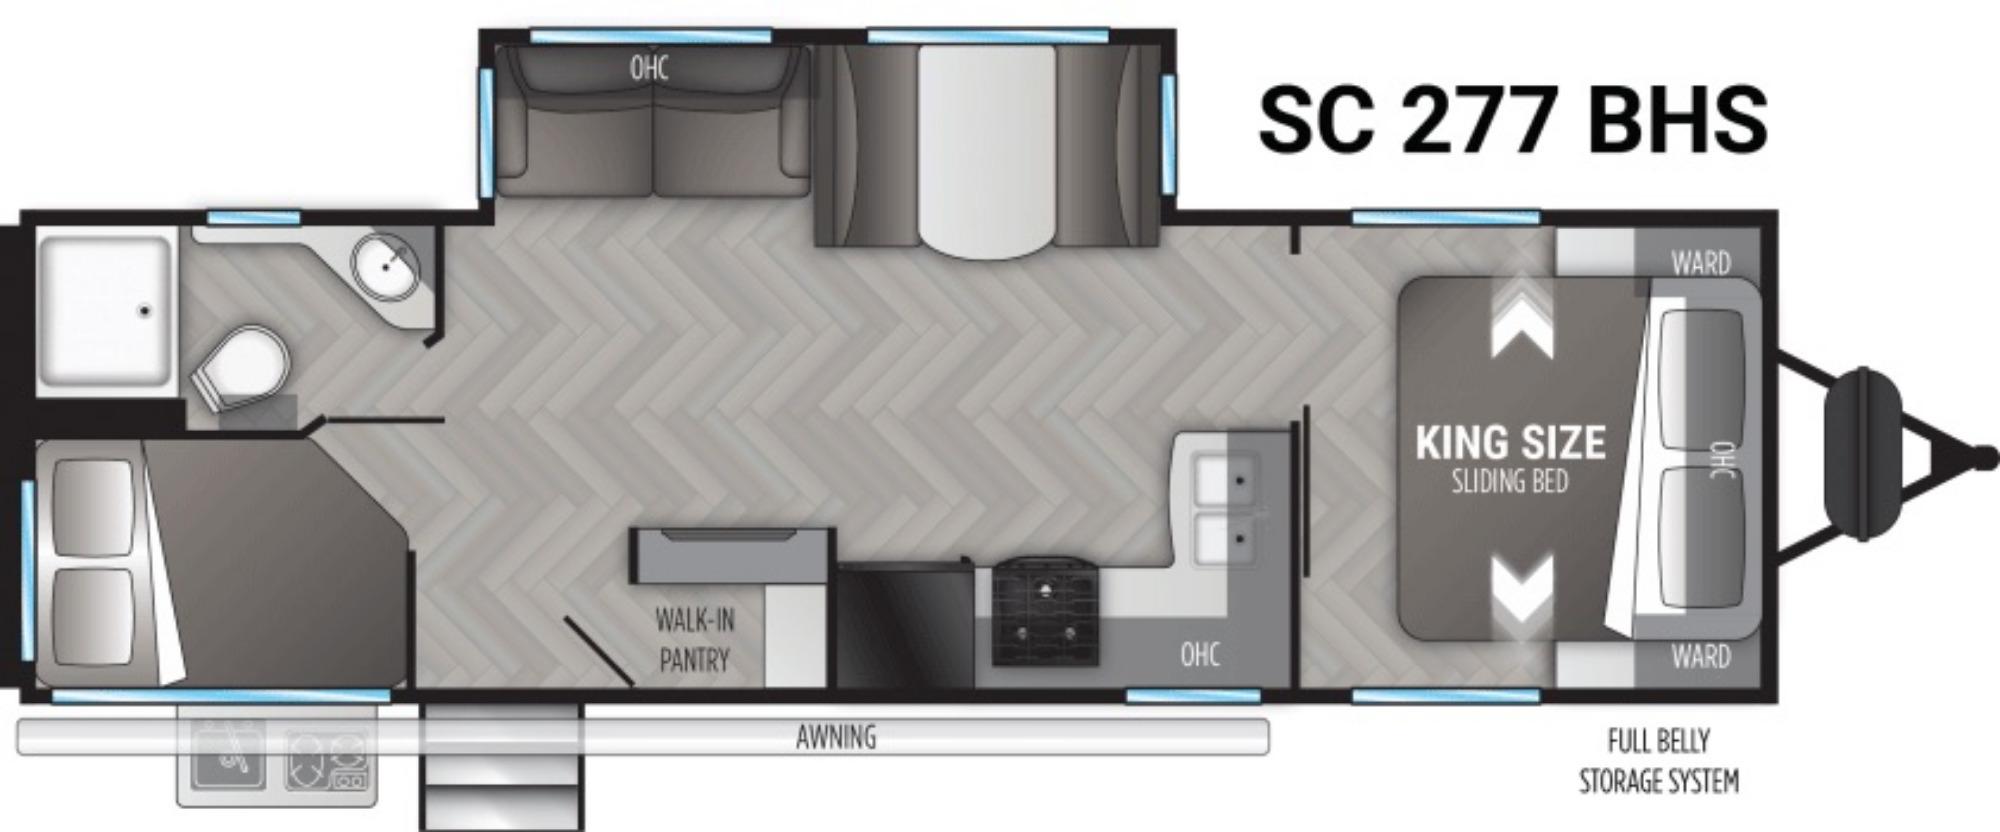 View Floor Plan for 2021 CRUISER RV SHADOW CRUISER 277BHS